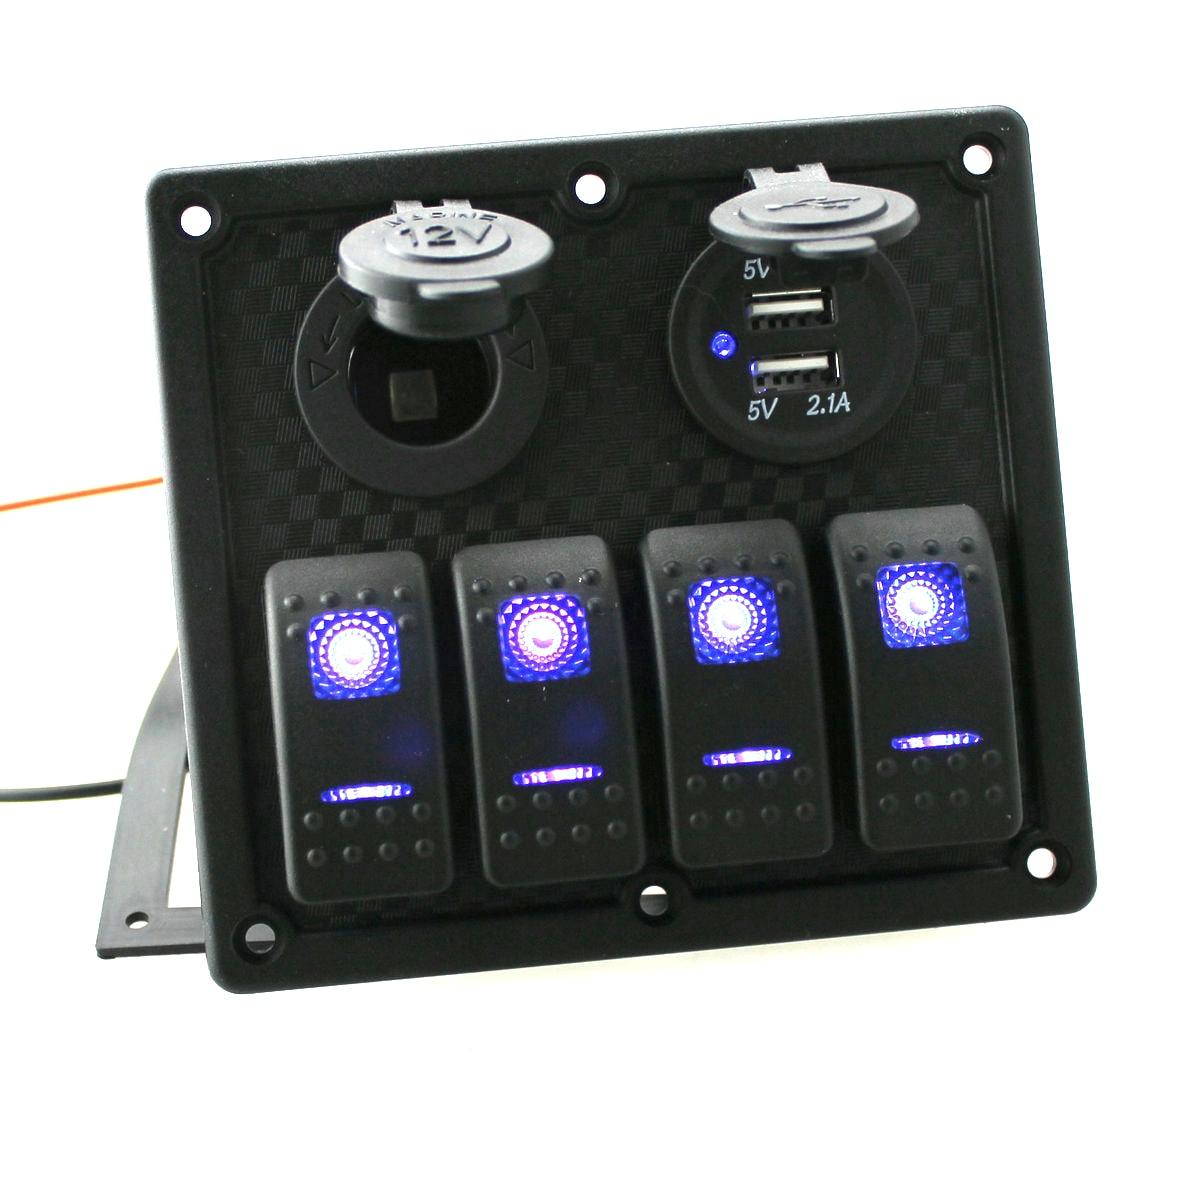 Us 32 19 8 Off Gang Circuit Led Car Marine Waterproof 5 Pin Boat Rocker Switch Panel With Fuse Dual Usb Slot Power Socket Breaker Voltmeter In Car